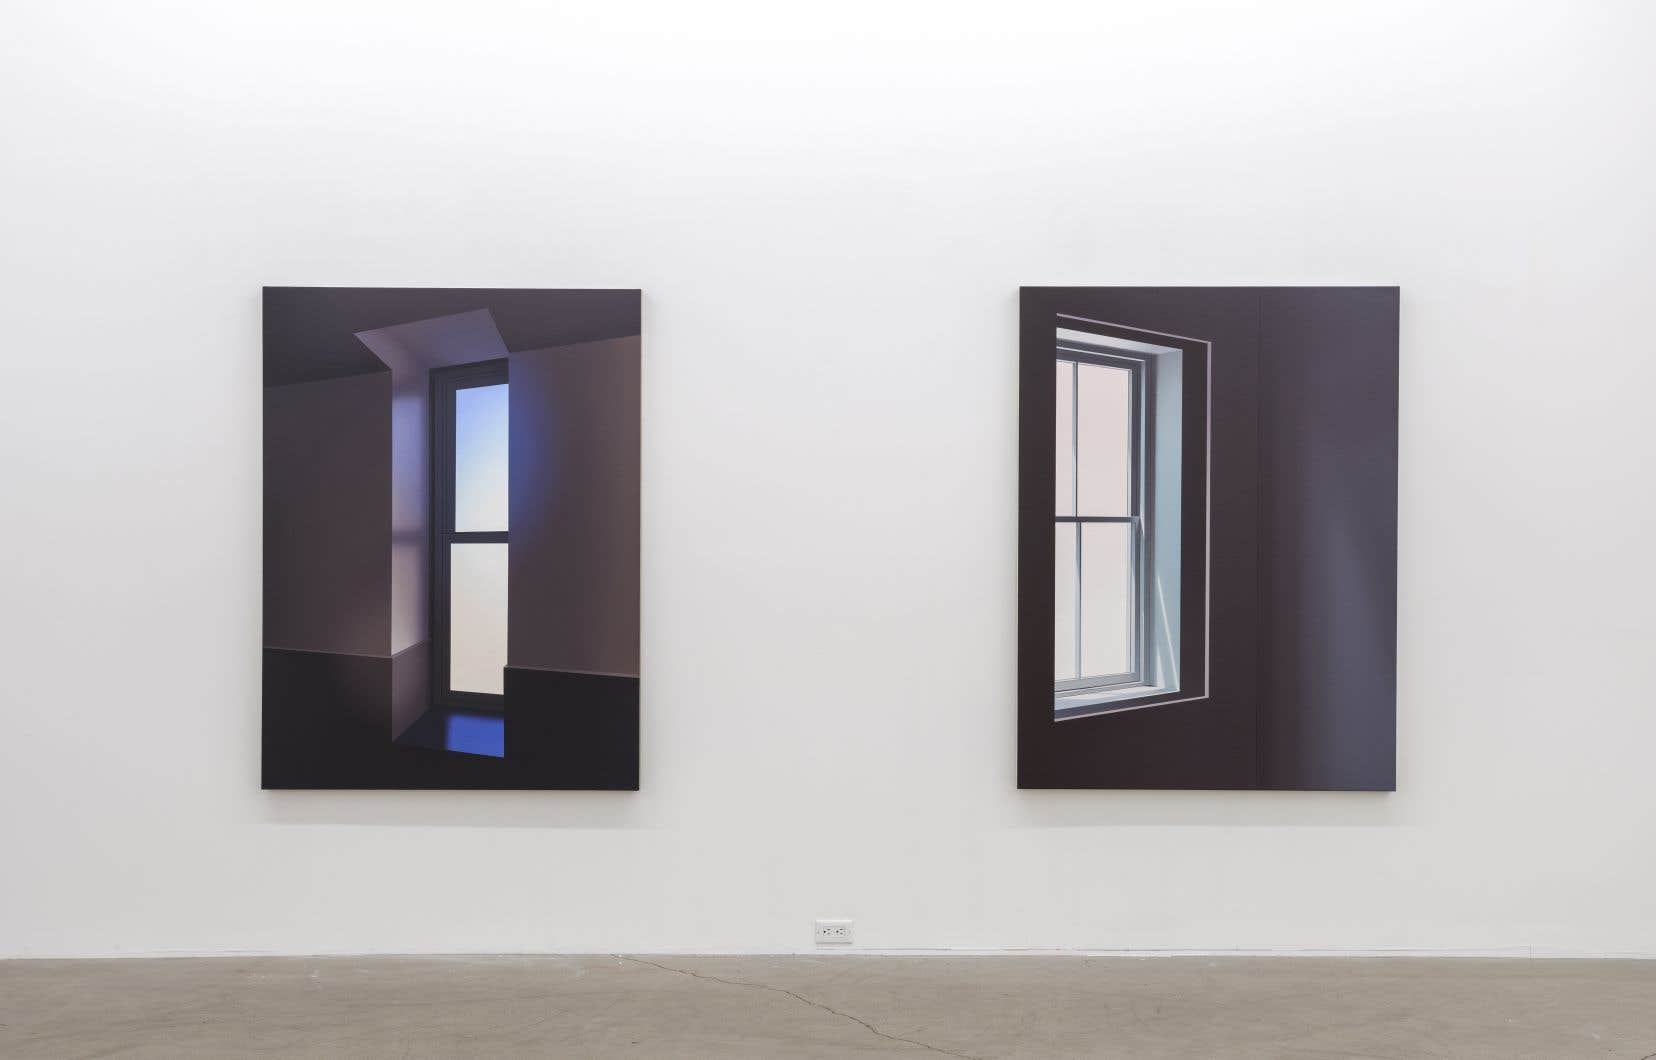 Vue de l'exposition de Pierre Dorion montrant «Exposure II» et «Window (RS)» de 2018